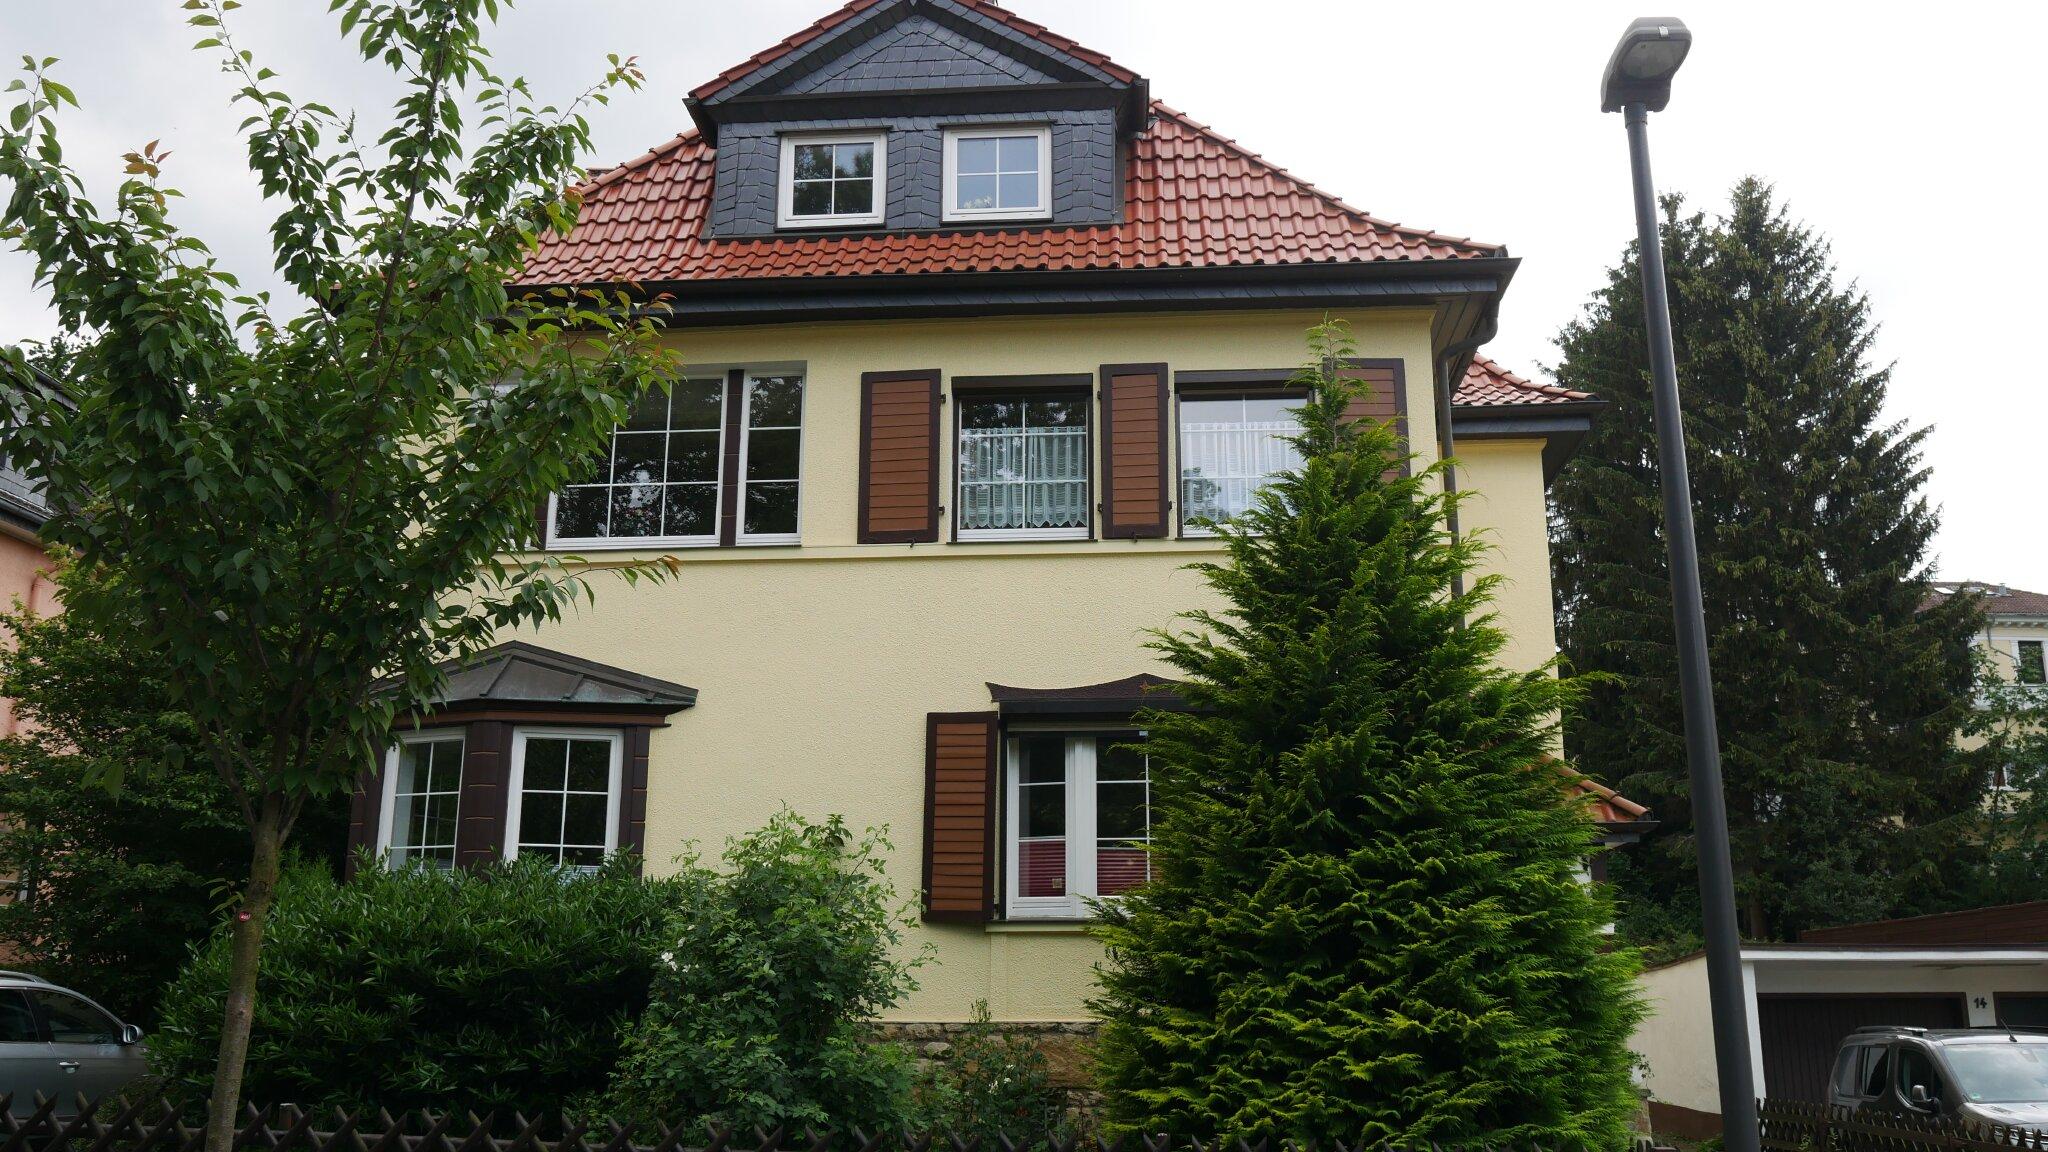 Villa Specht